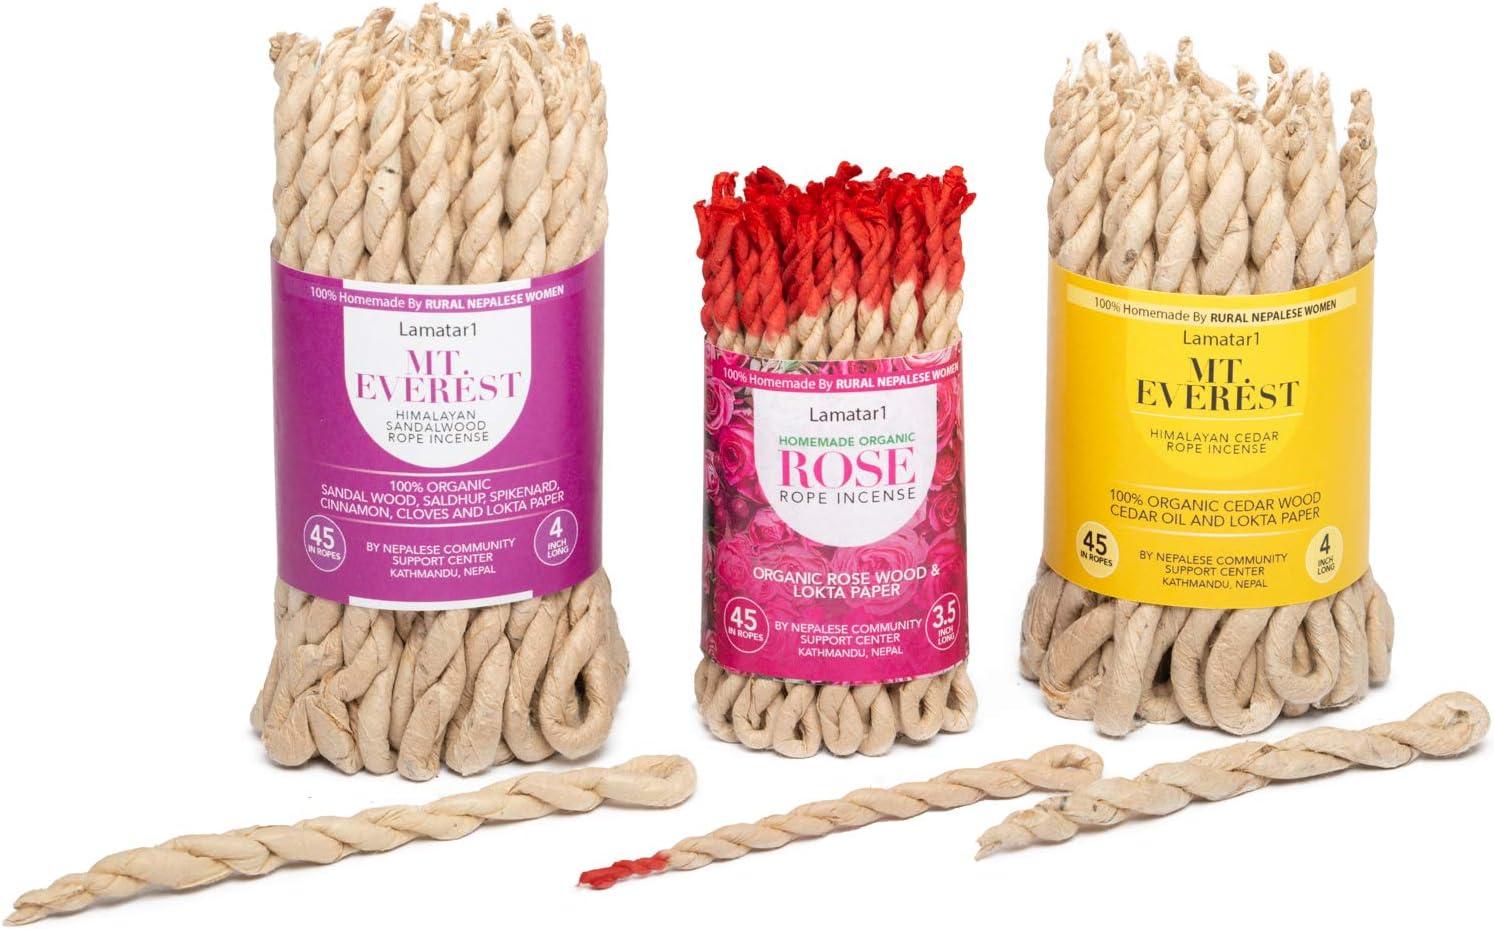 Aromatherapy Set of 3 Tibetan Home Made Rose Rope Incense, Himalayan Cedar, Sandalwood, 100 % Handmade by Rural Nepali Women (Himalayan Cedar, Sandalwood and Rose)